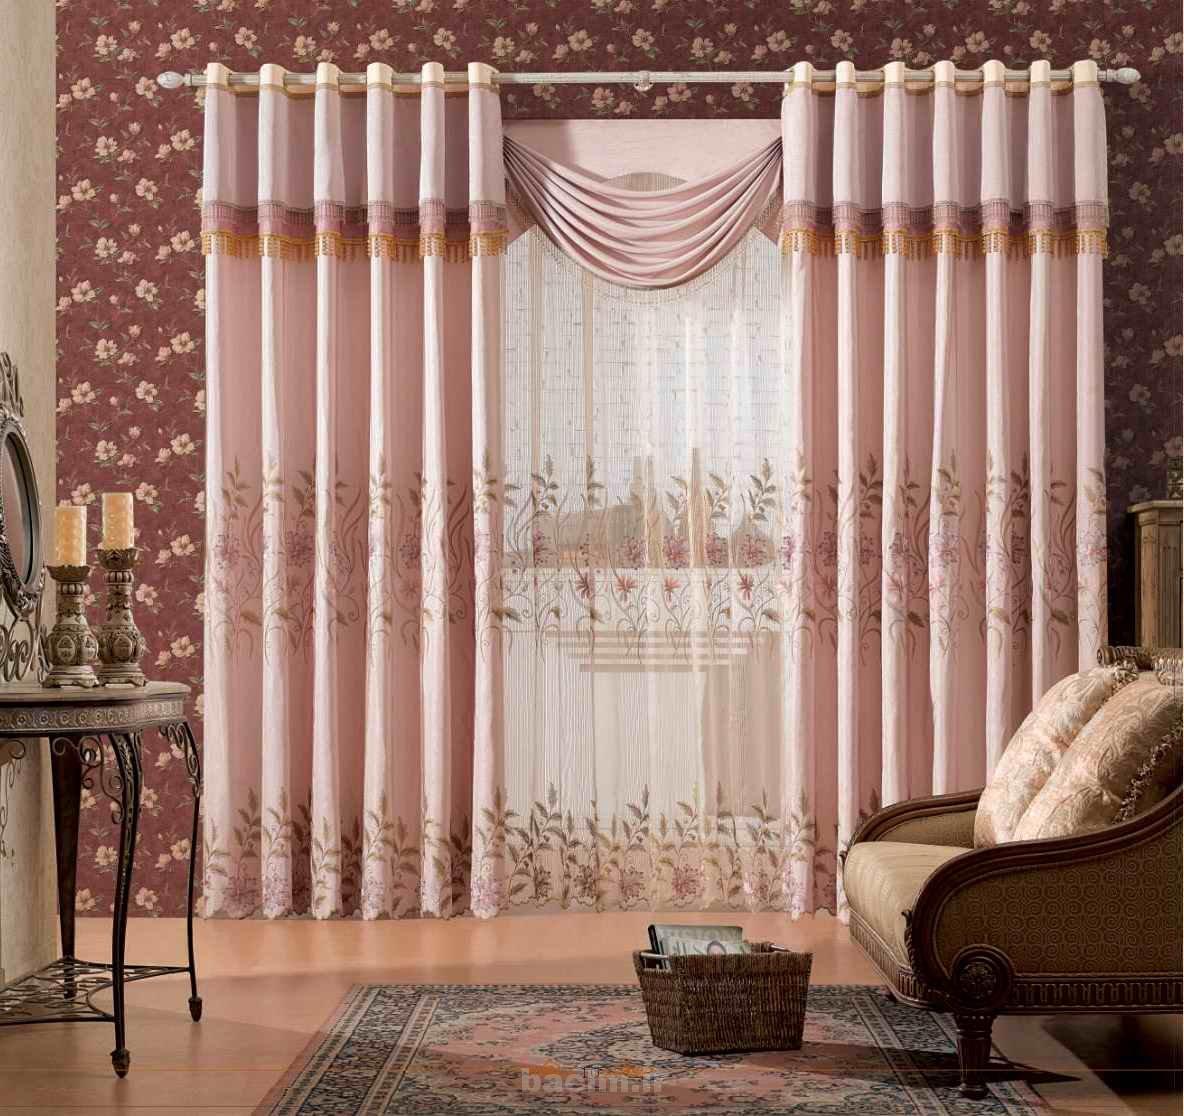 curtains for living room 9 Curtains For Living Room